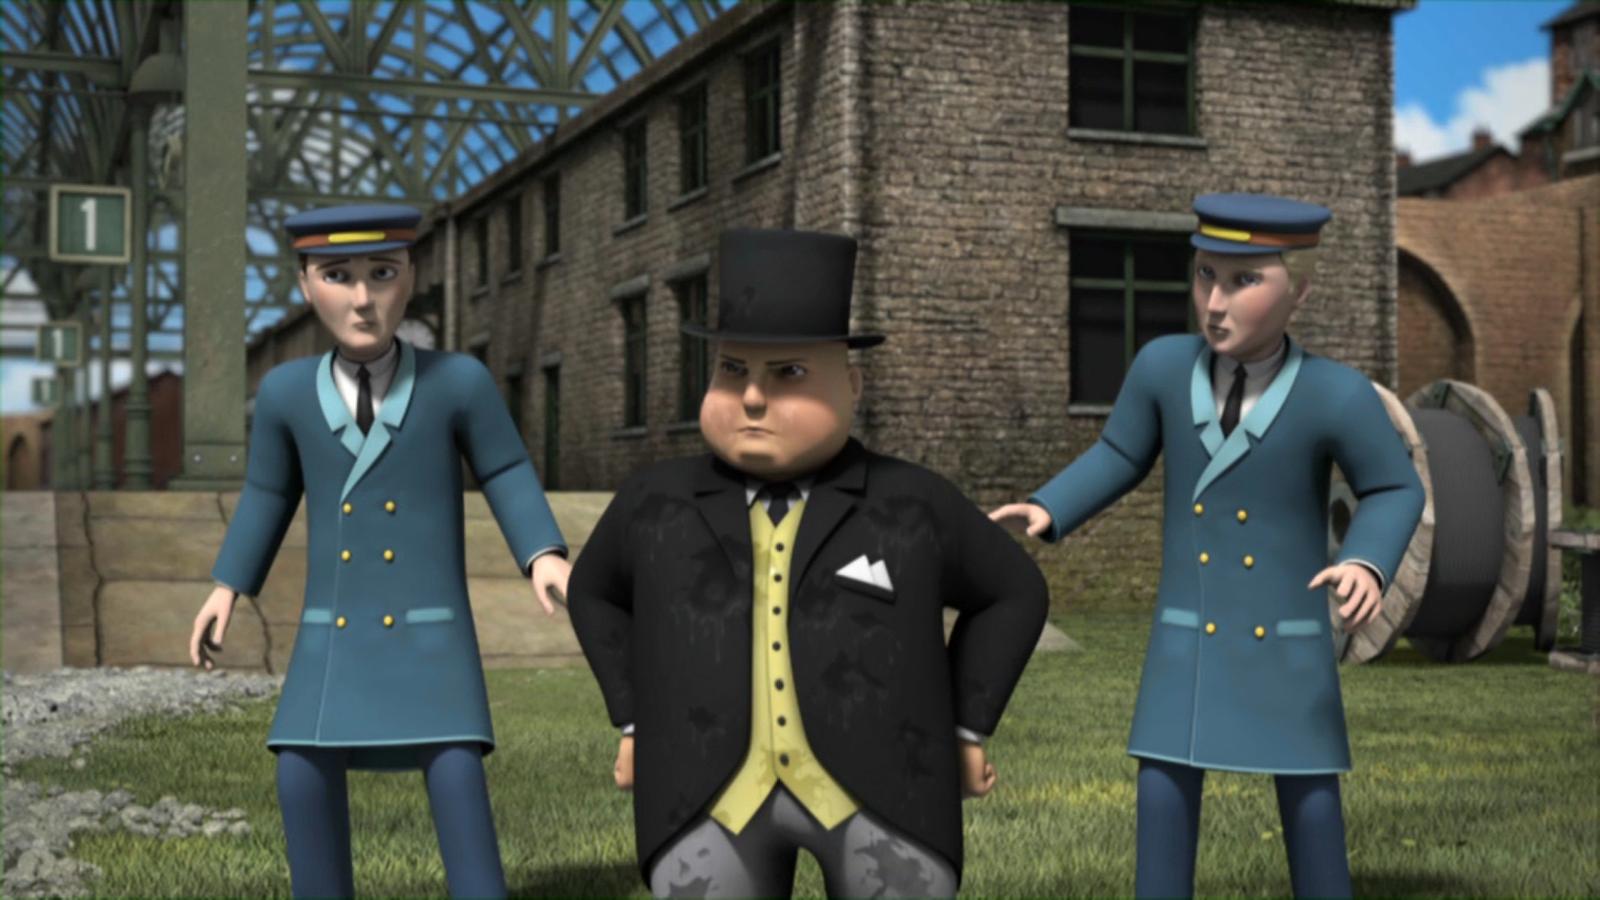 Sir Topham Hatt's Assistants